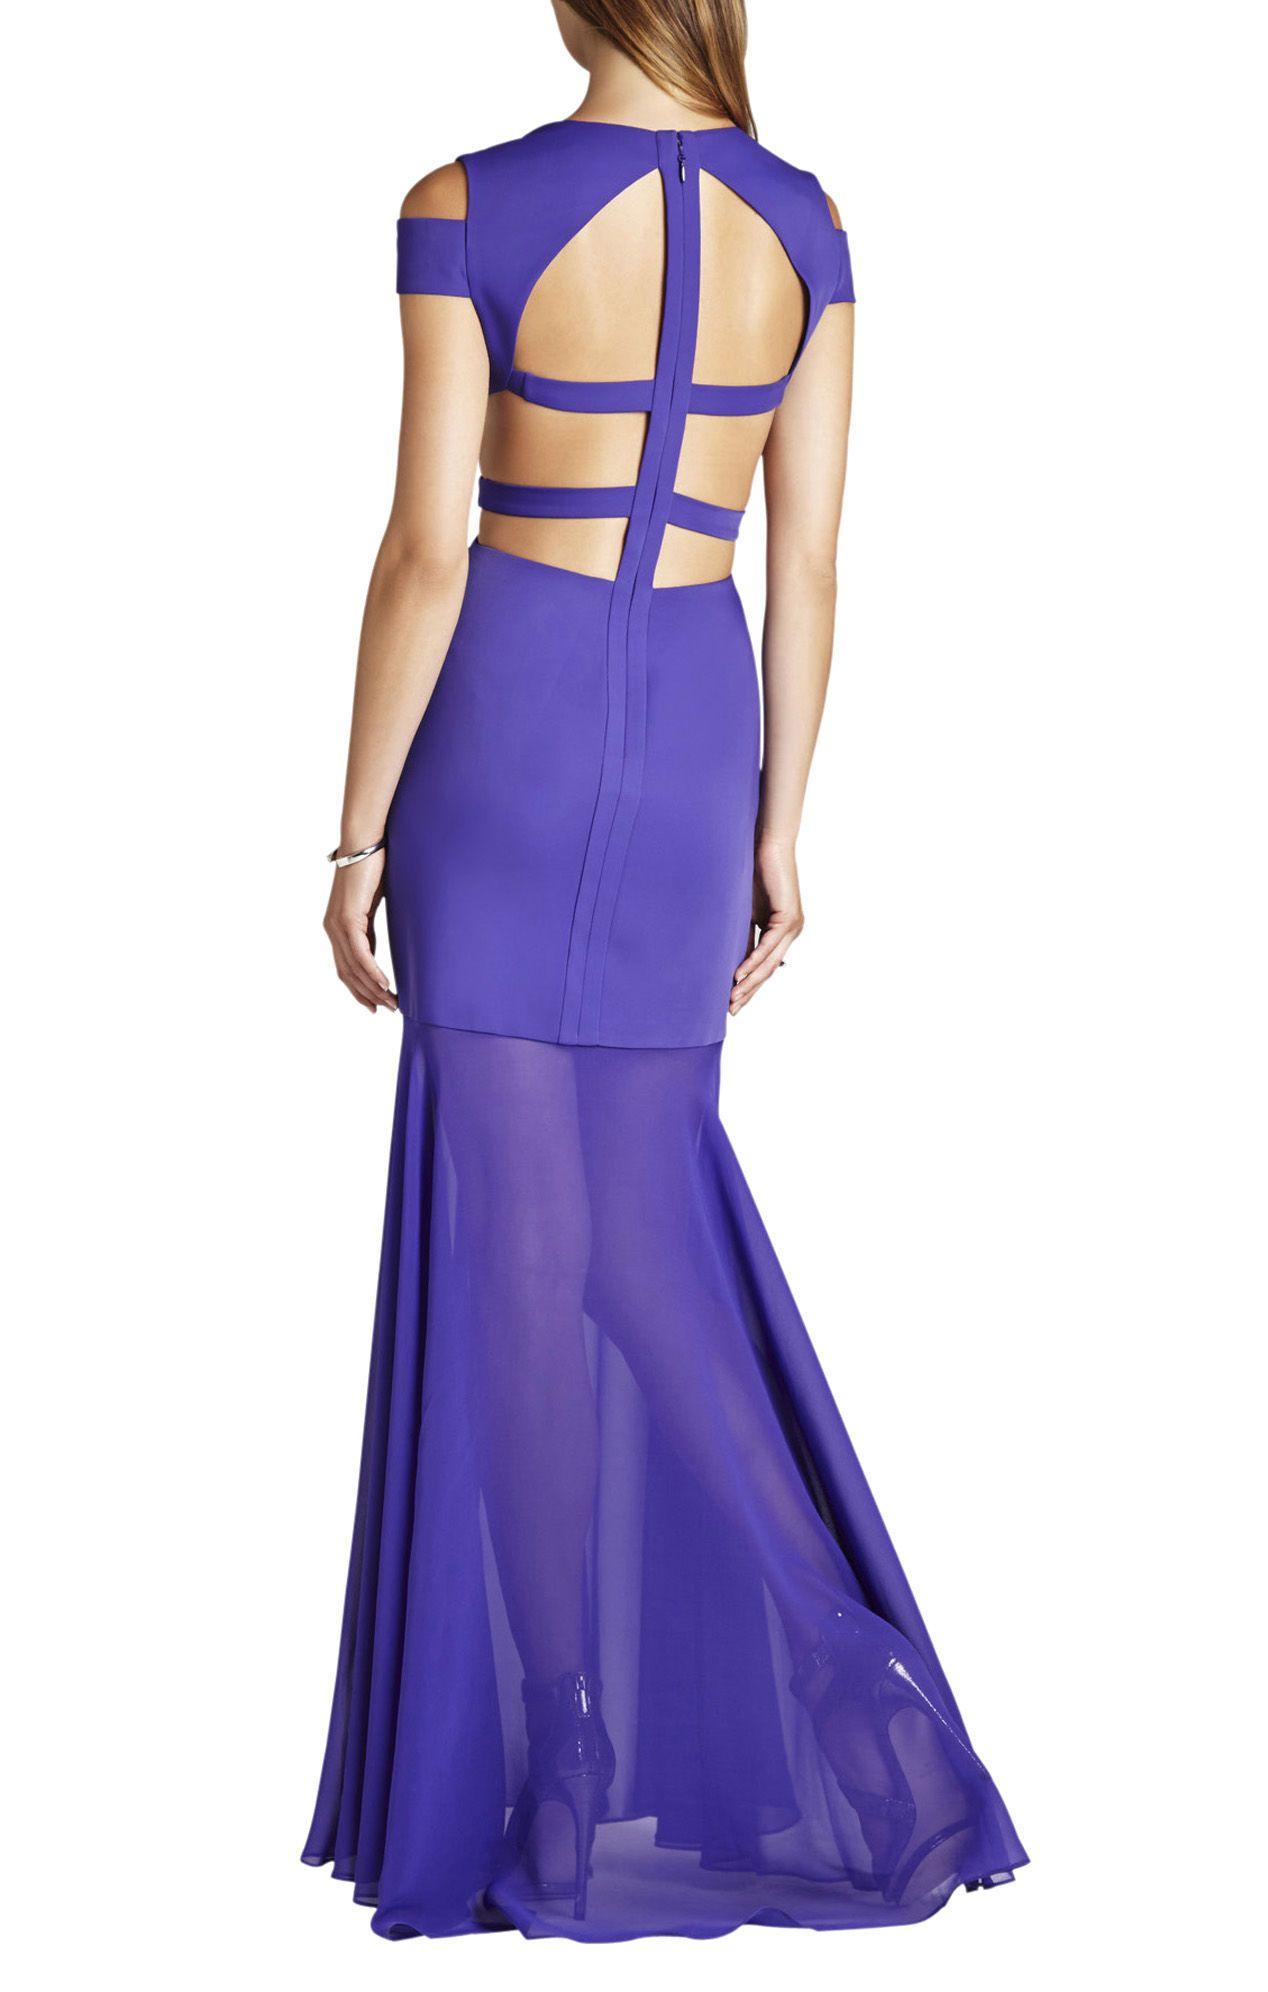 BCBGMAXAZRIA Ava Cutout Gown | BCBG.com | SUNSHINE | Pinterest